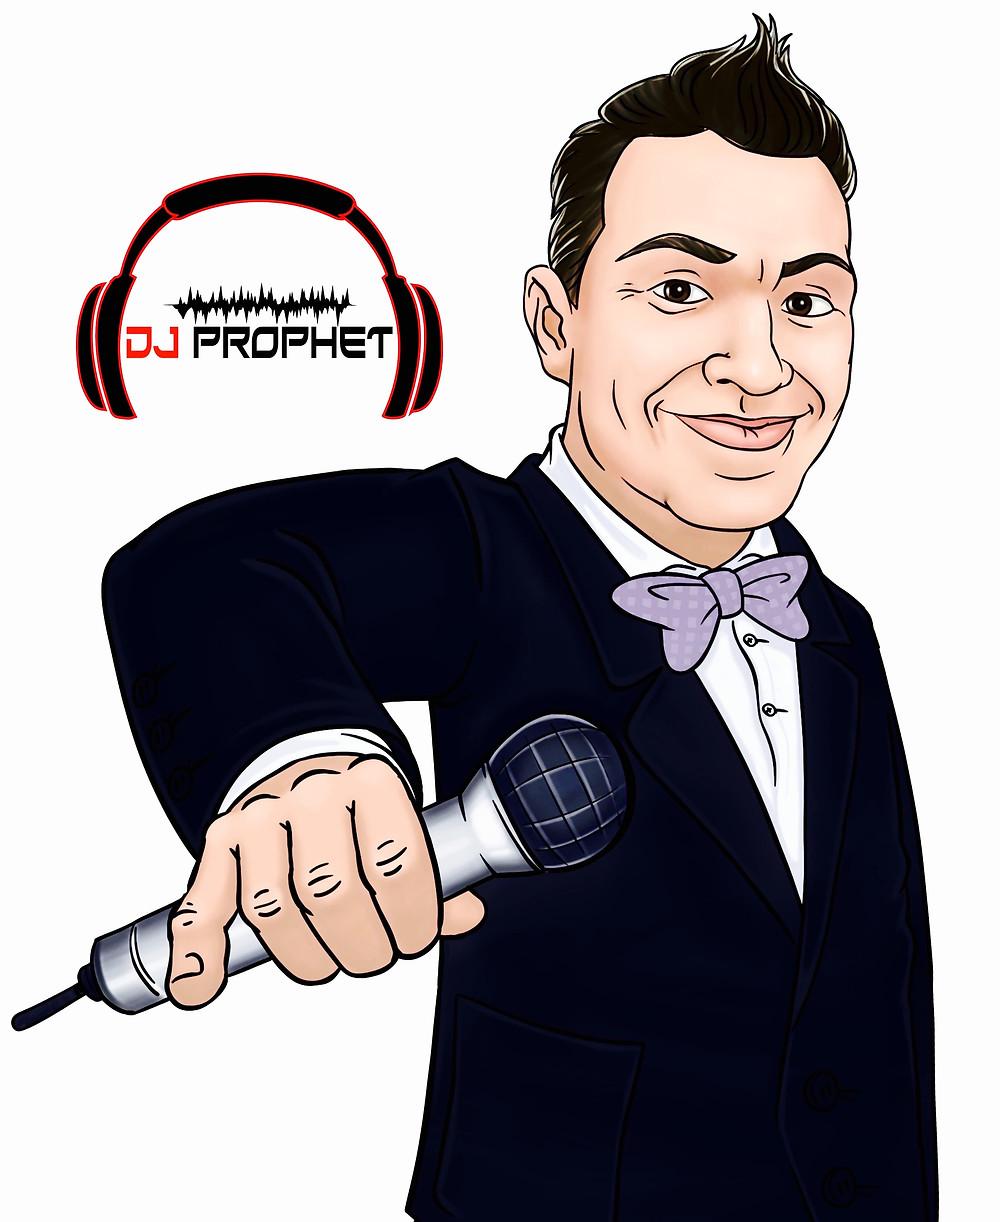 Spanish DJ | DJ Prophet